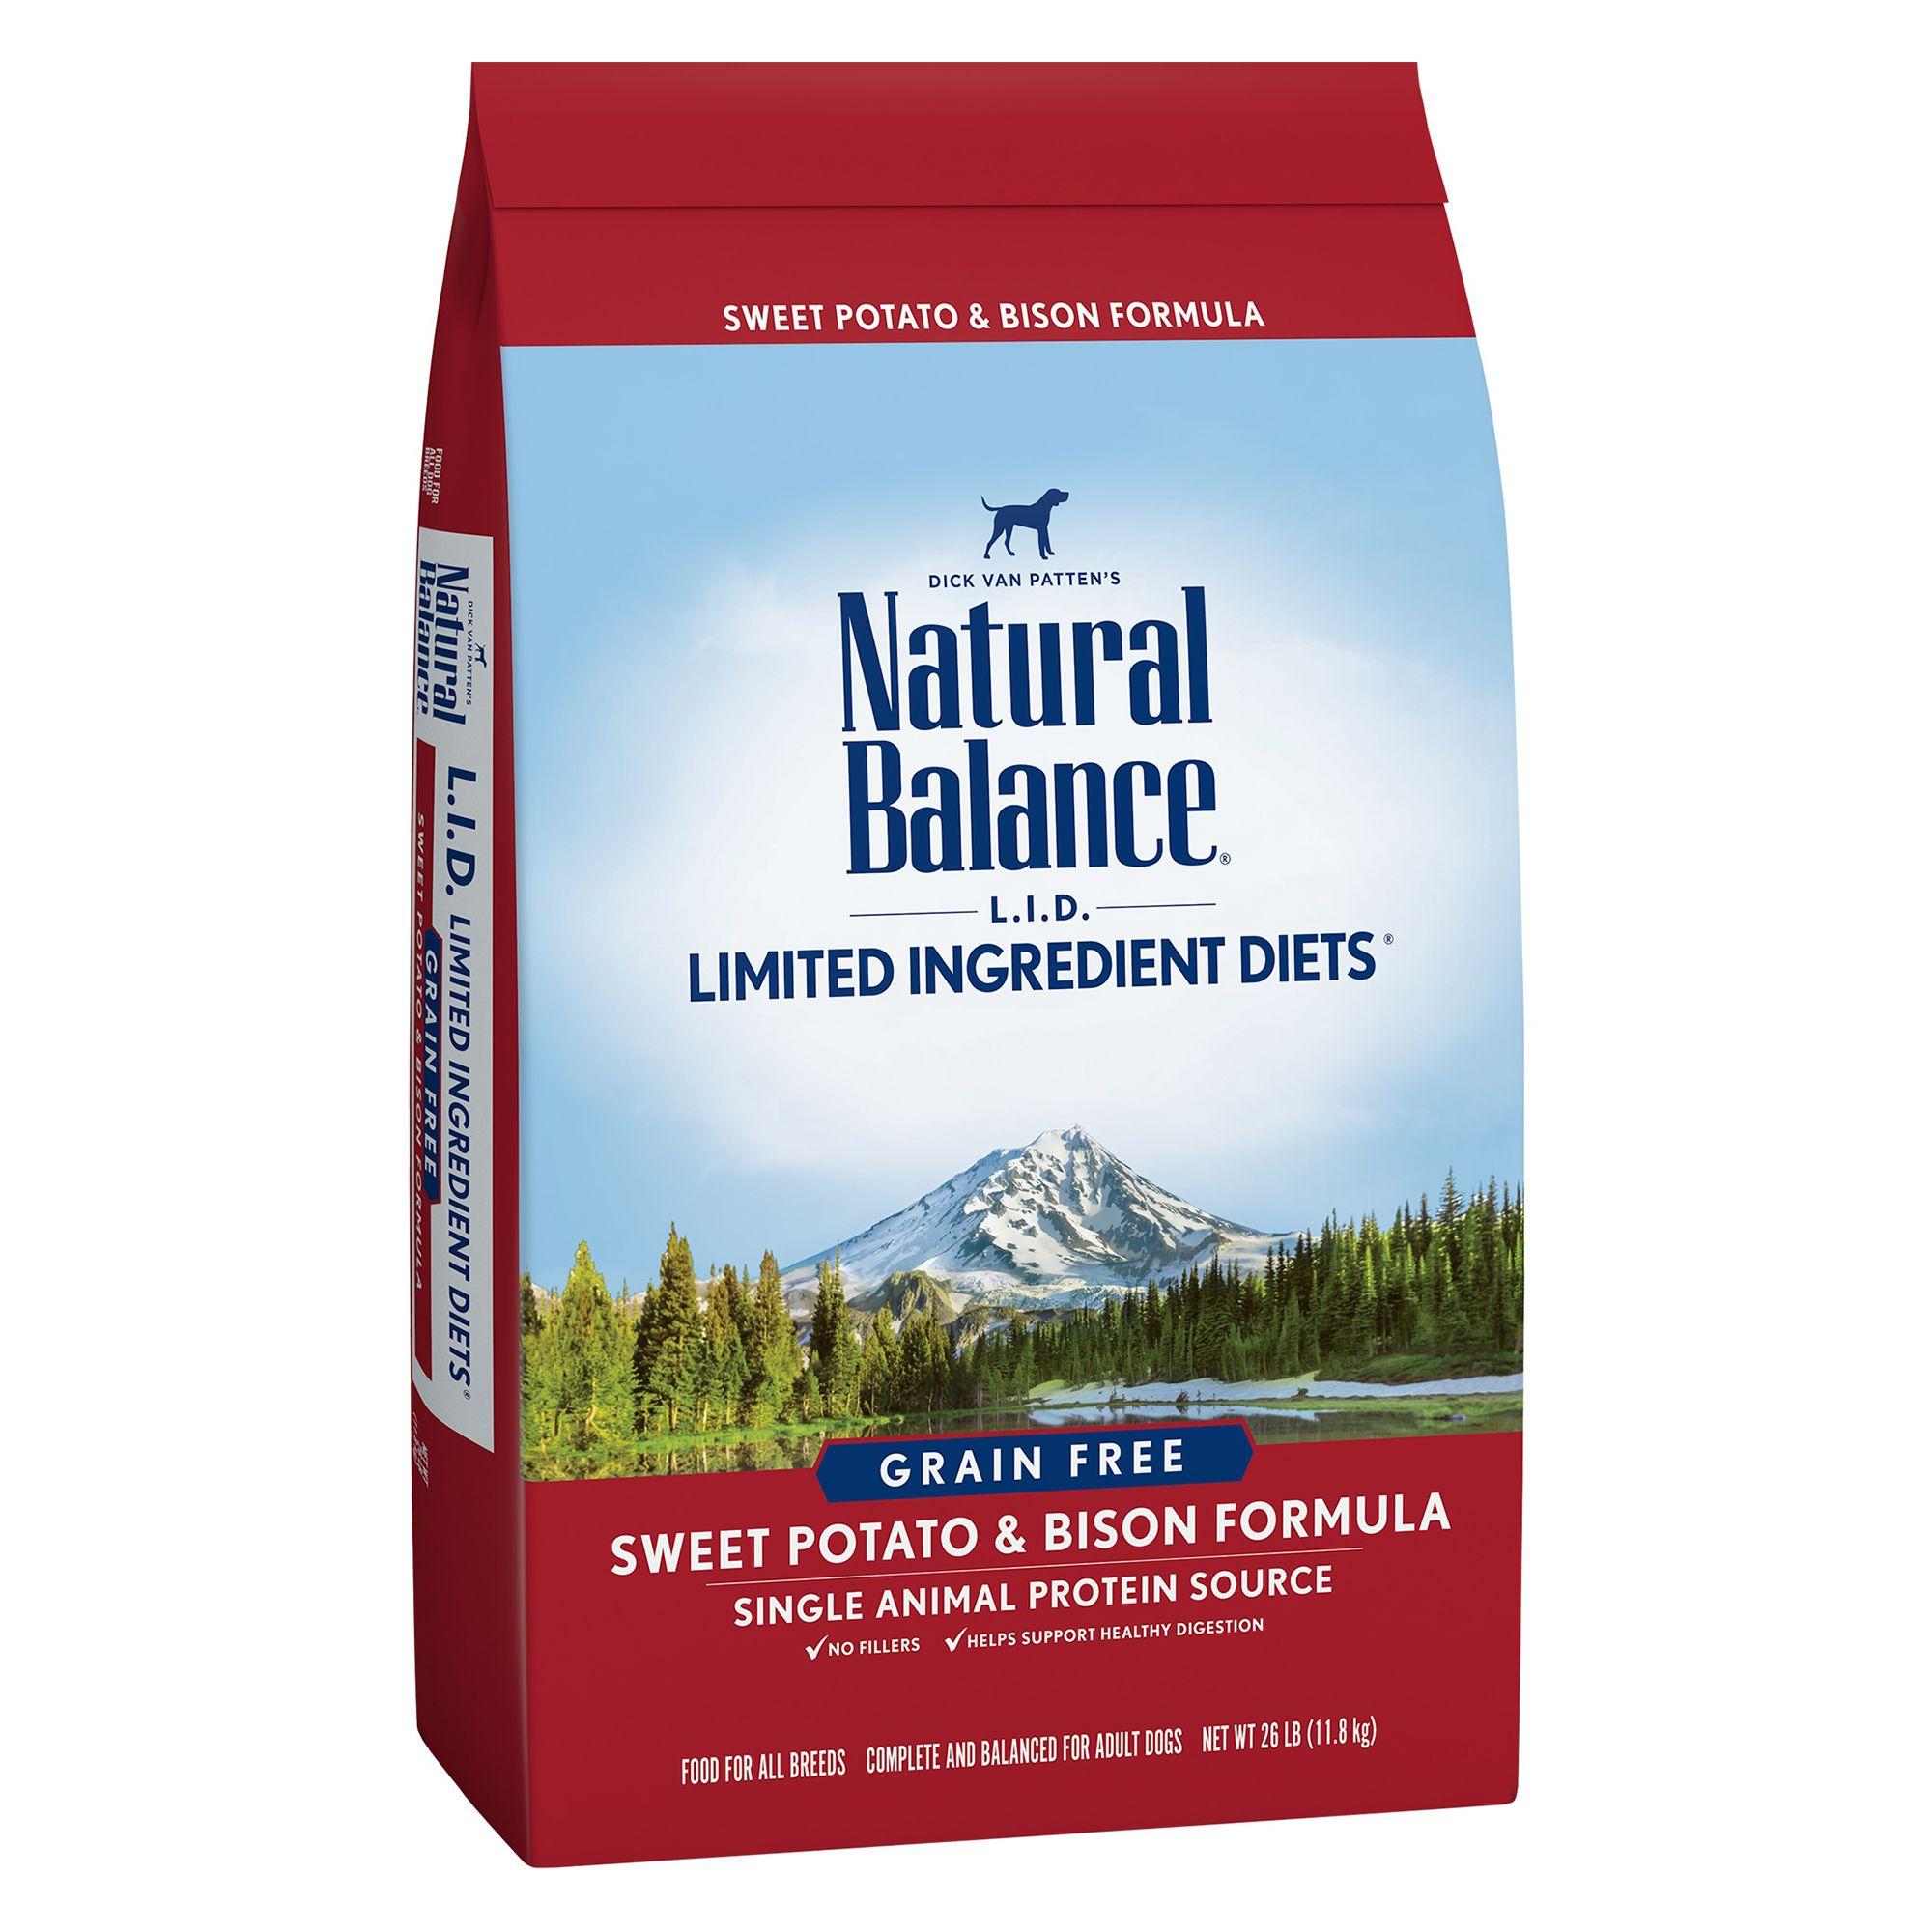 Petsmart Canidae Dog Food Grain Free Dry Dog Food